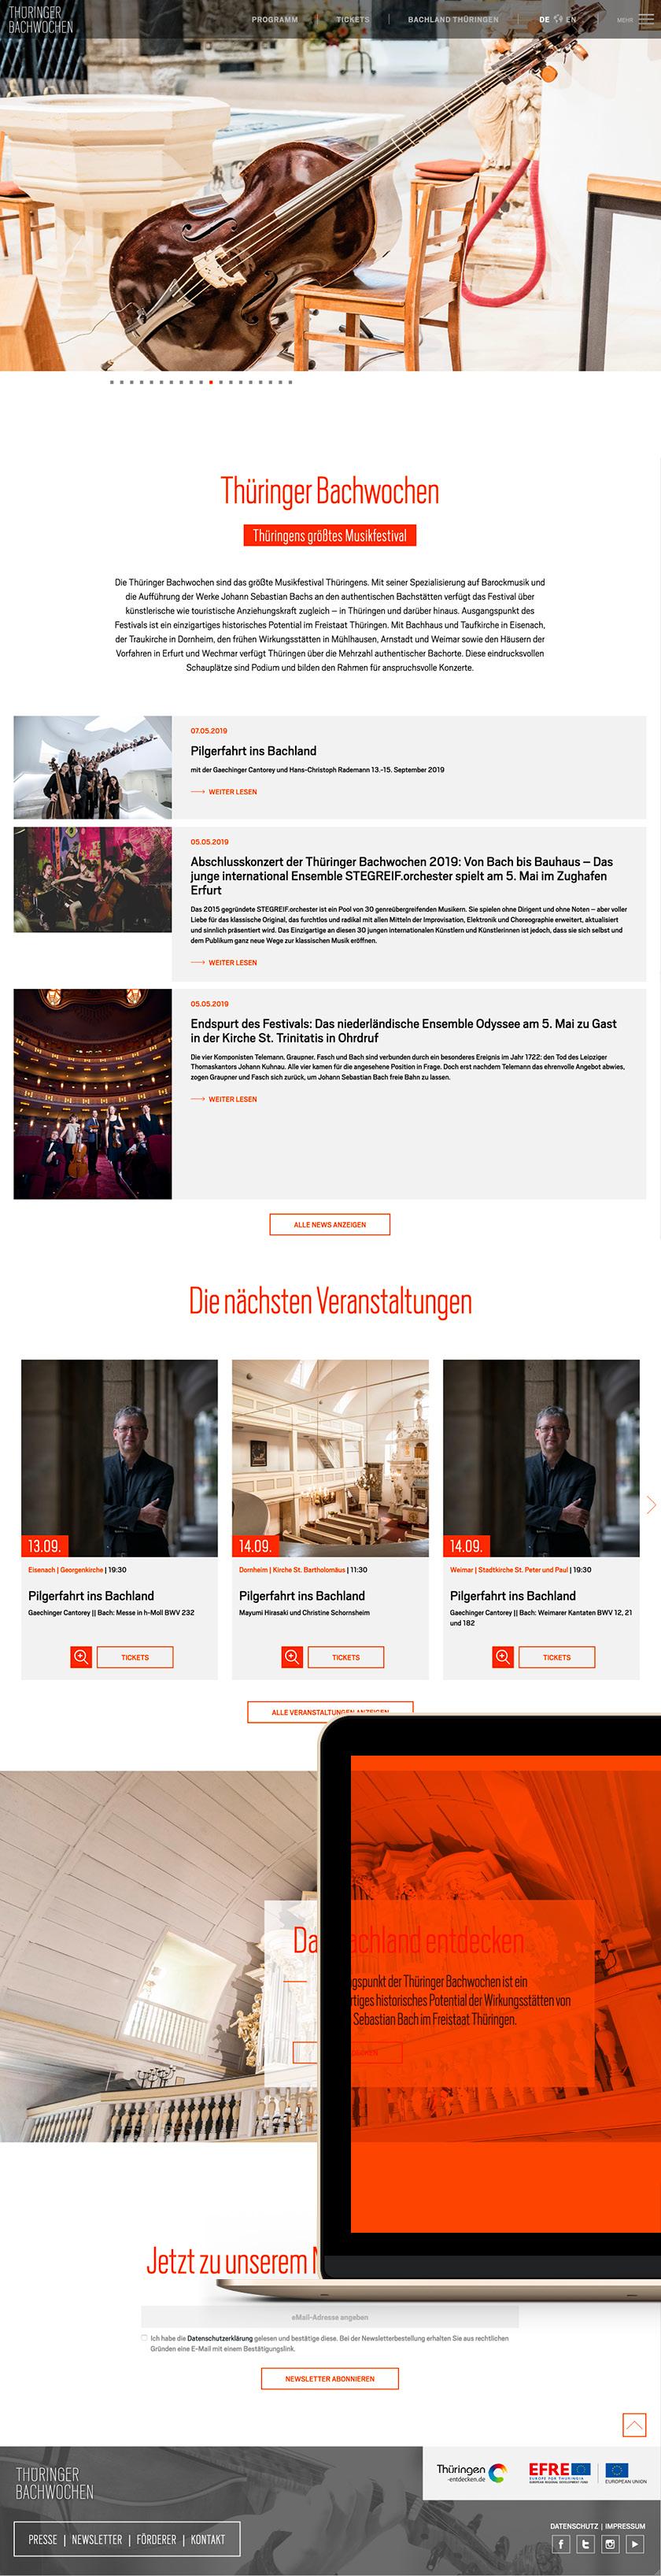 Samt&Seidel_Referenz_Thüringer Bachwochen_Design_01